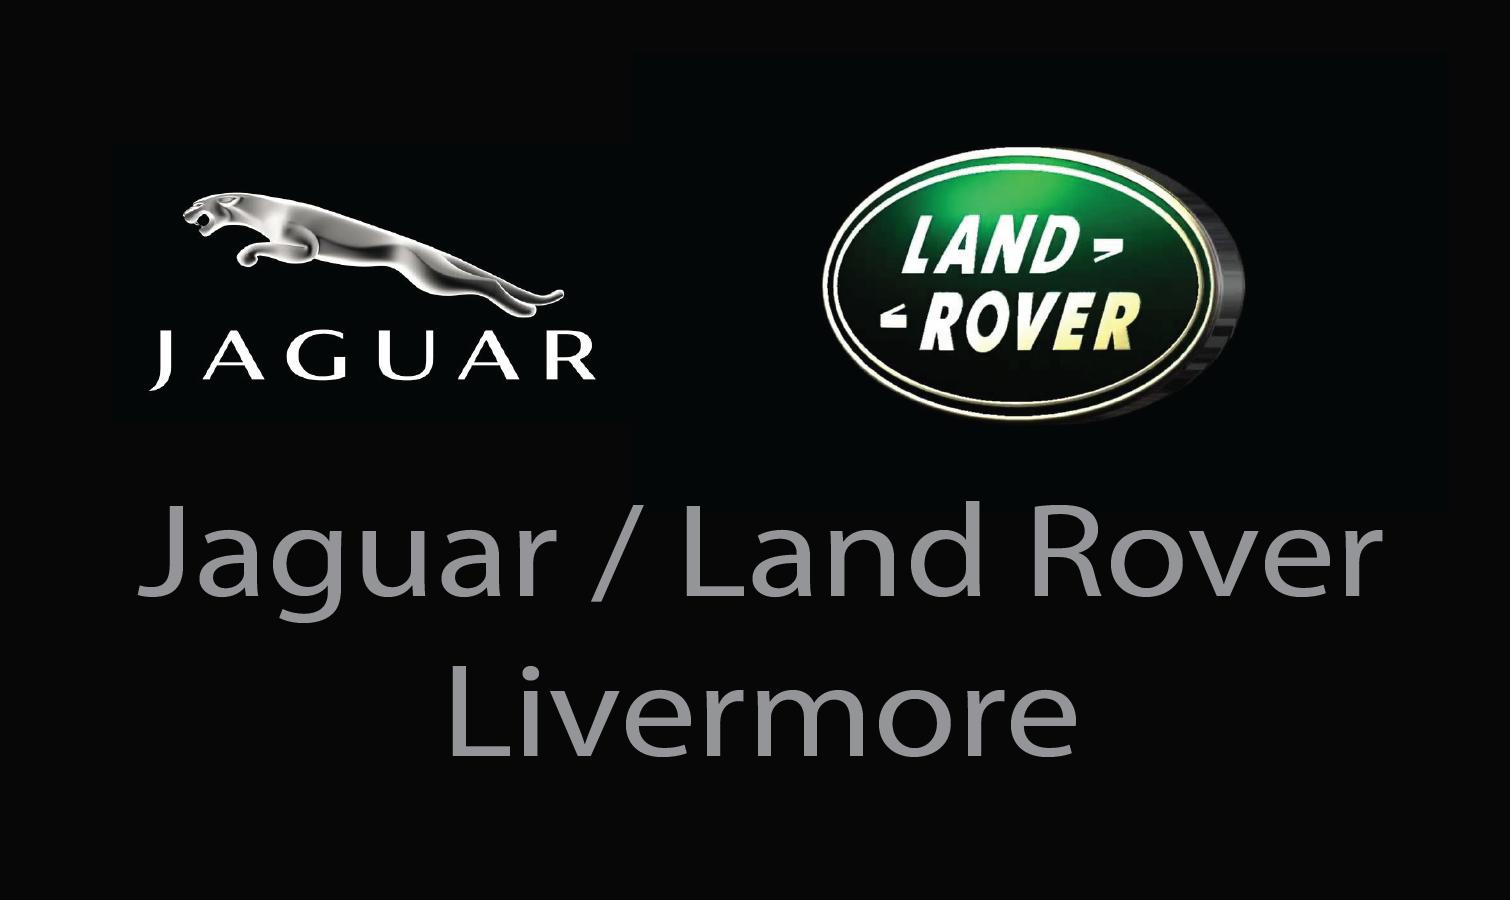 Jaguar / Land Rover of Livermore